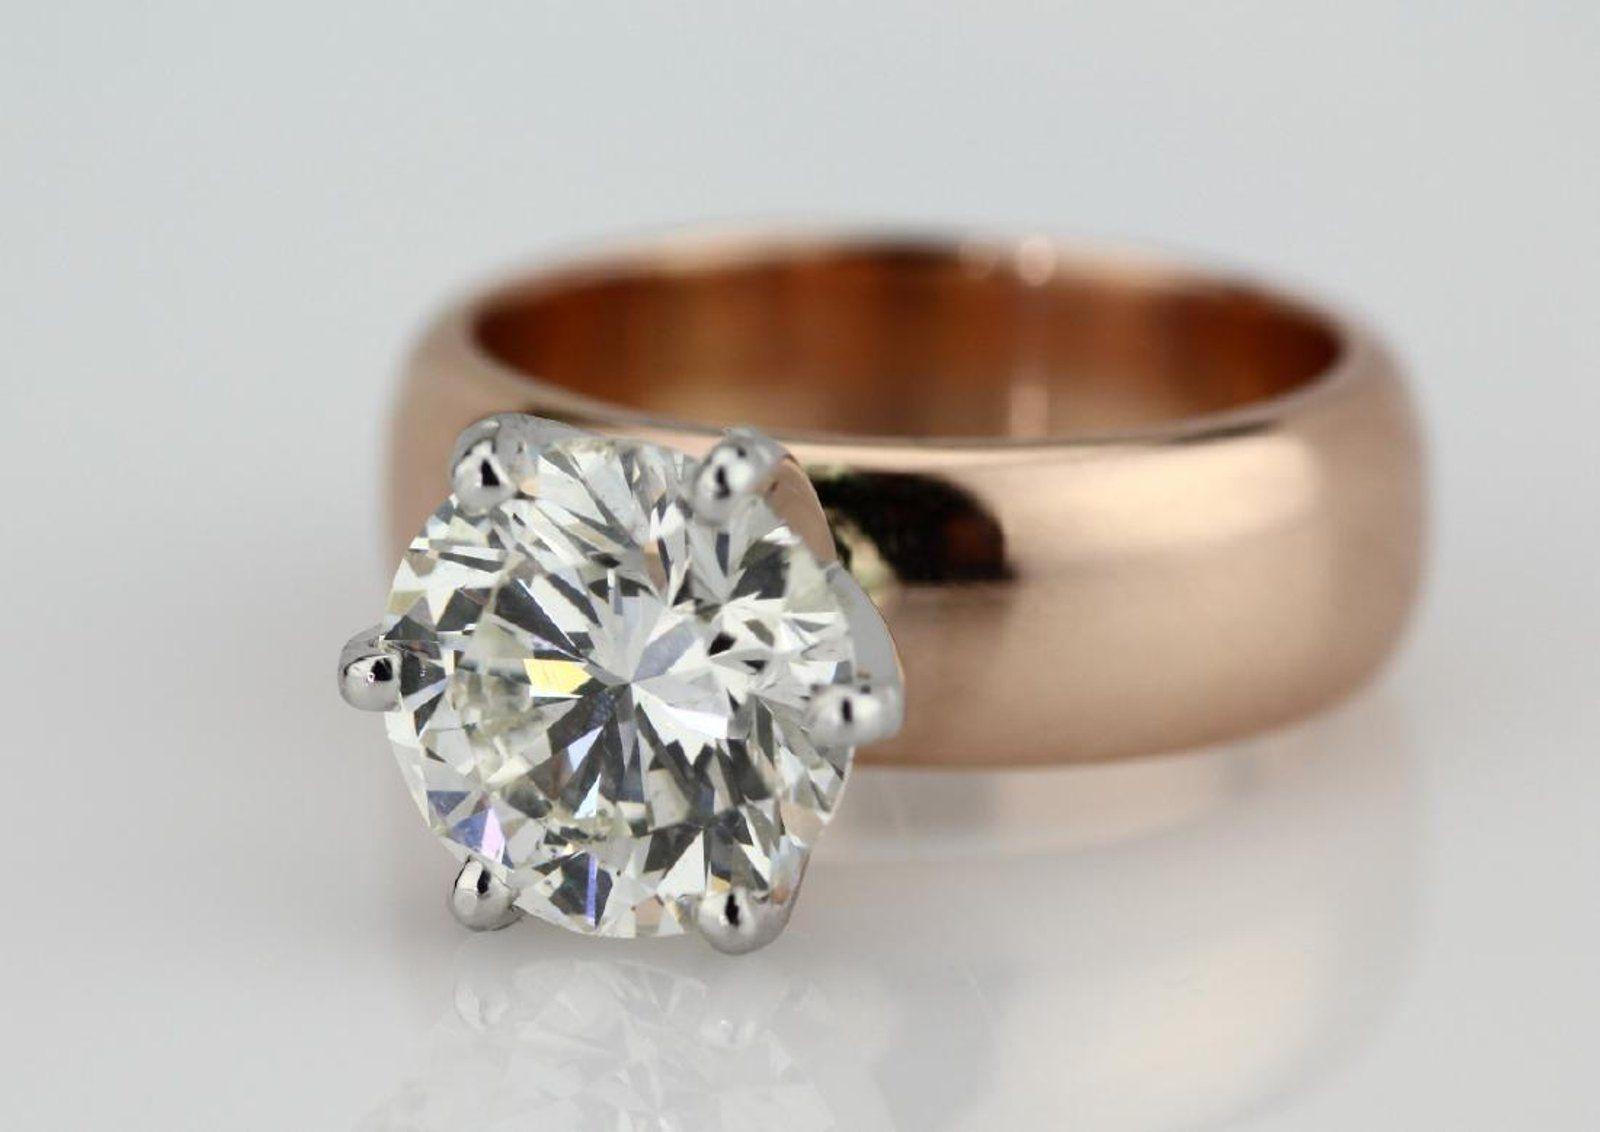 4.01ct SI1/H-I Diamond in 14K Rose Gold Setting - 6